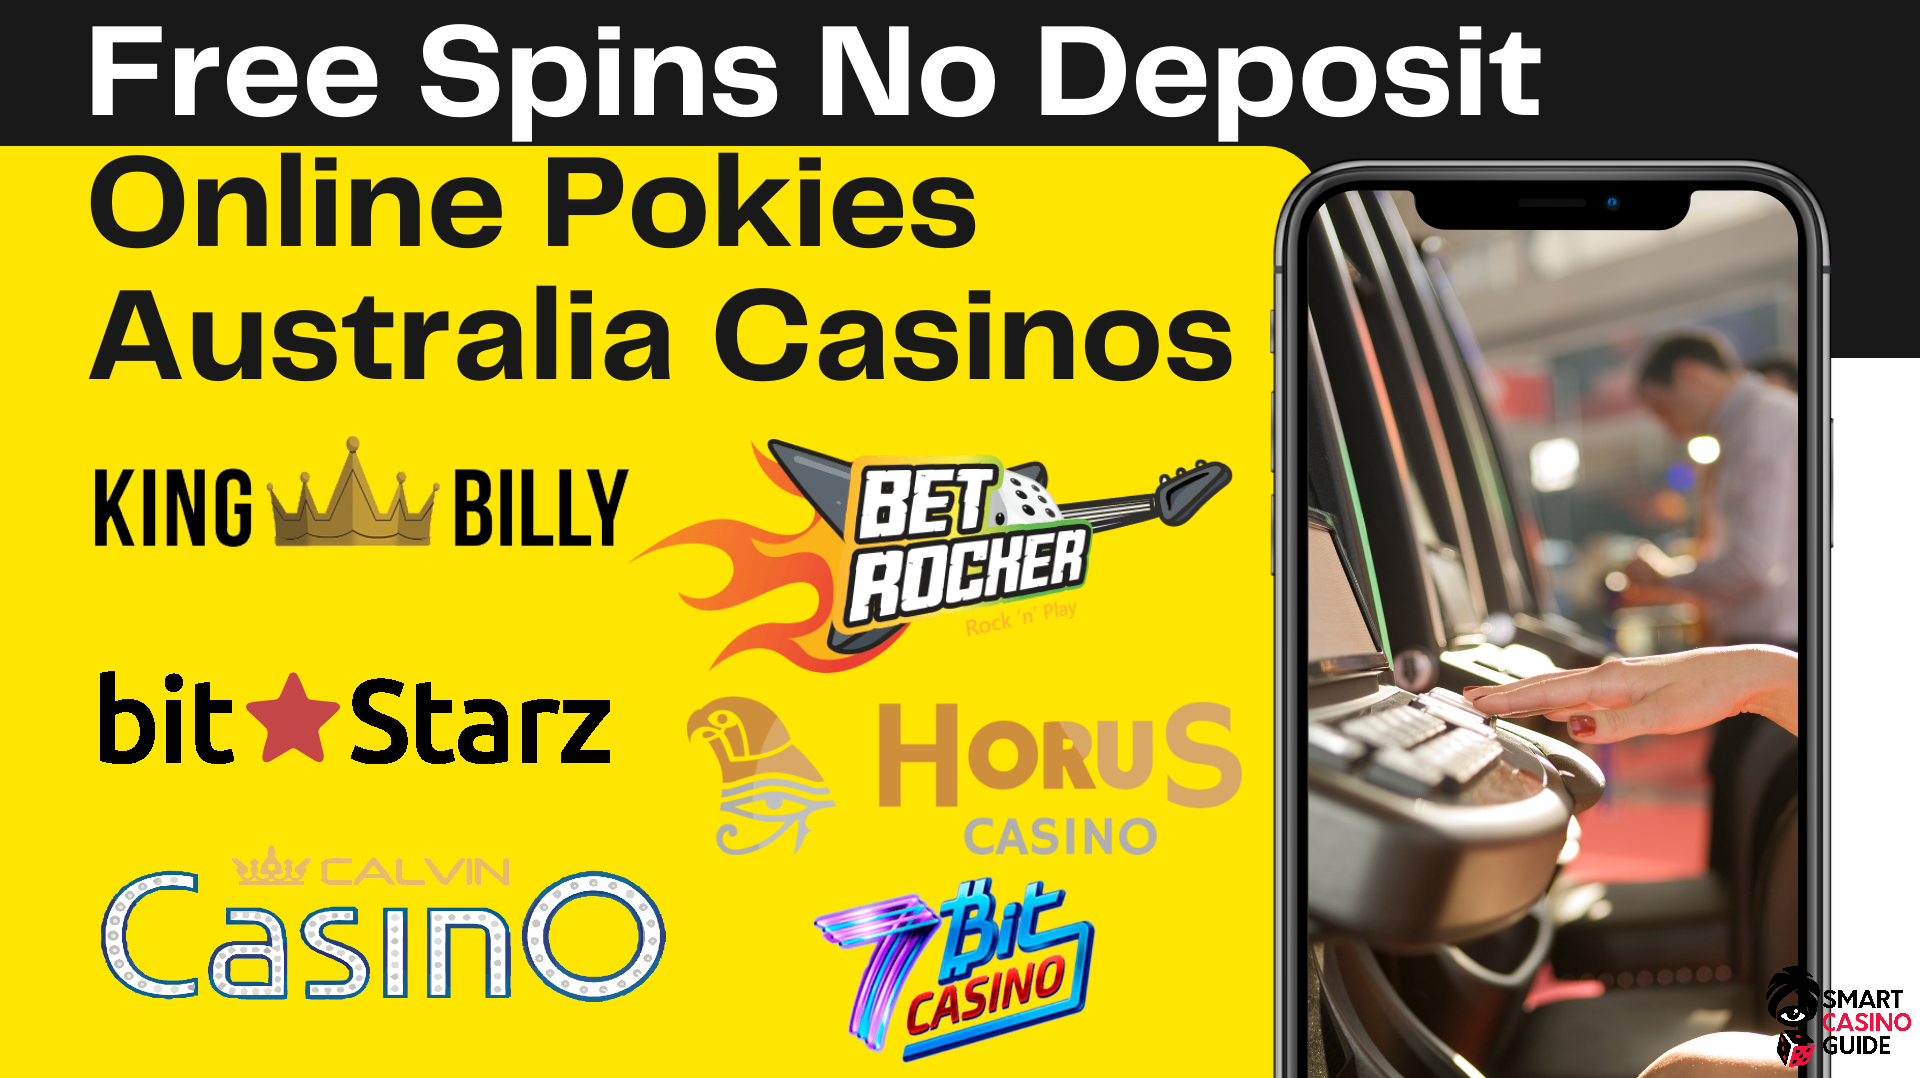 Pokies Online No Deposit